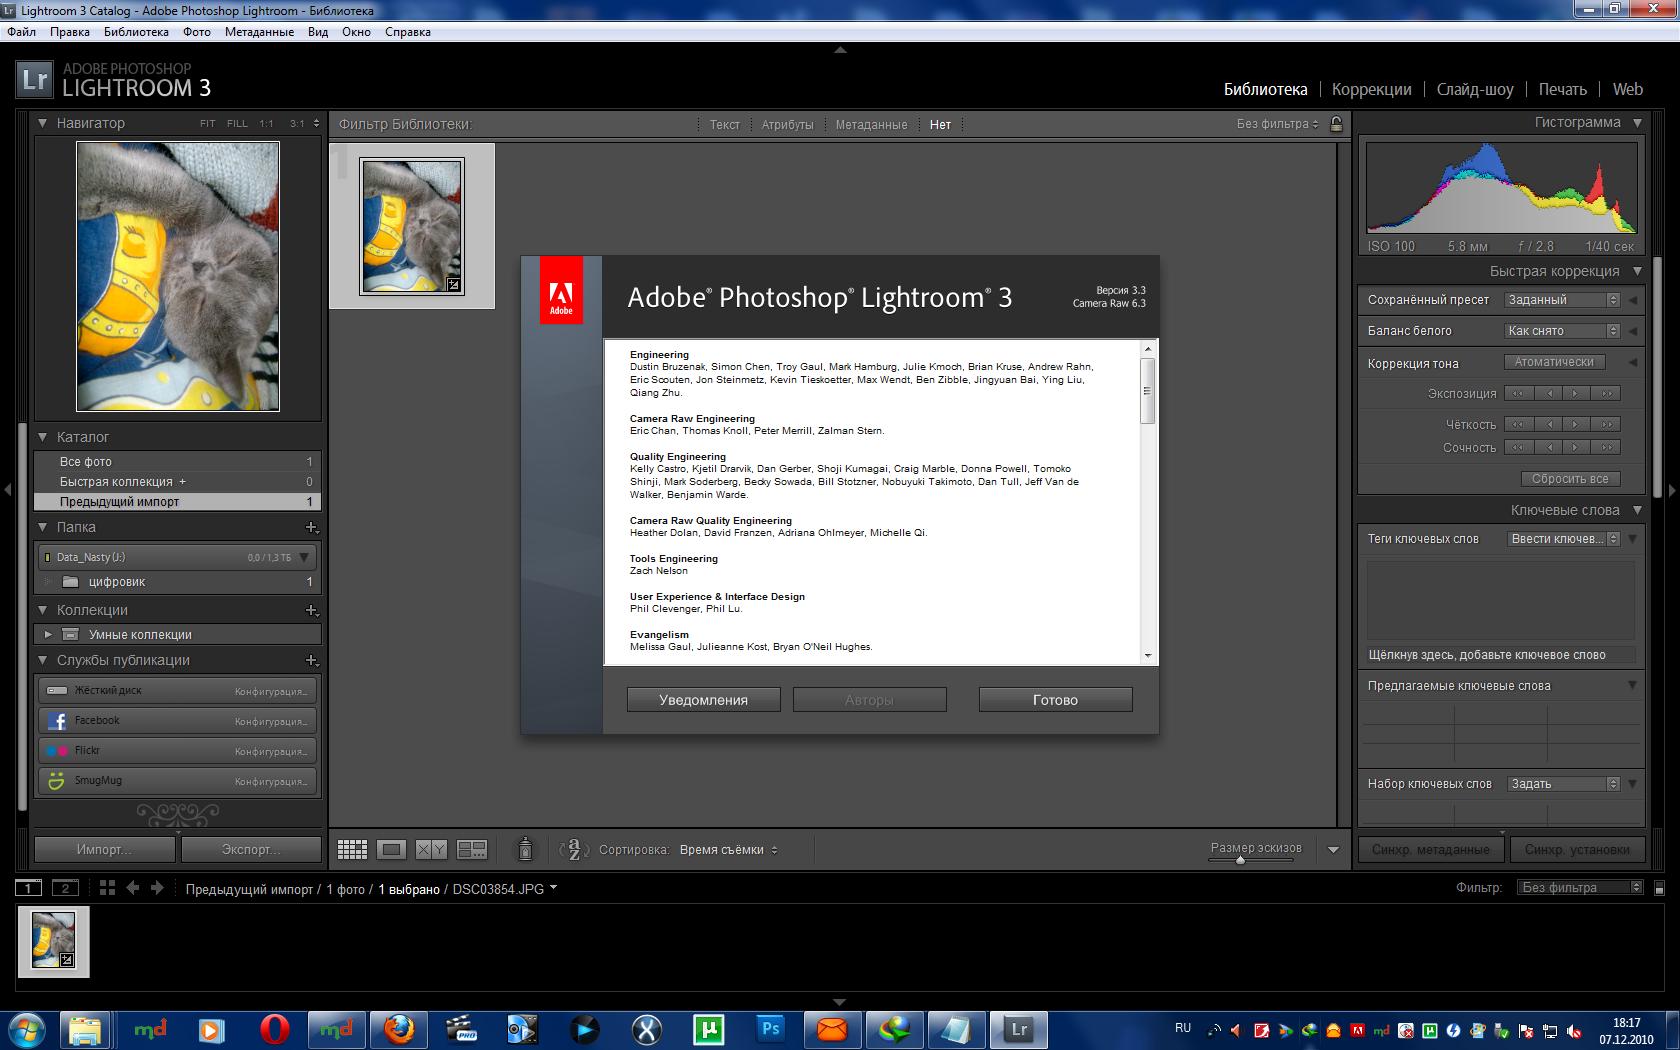 Adobe Photoshop Lightroom 3.3 Final (x32x64)